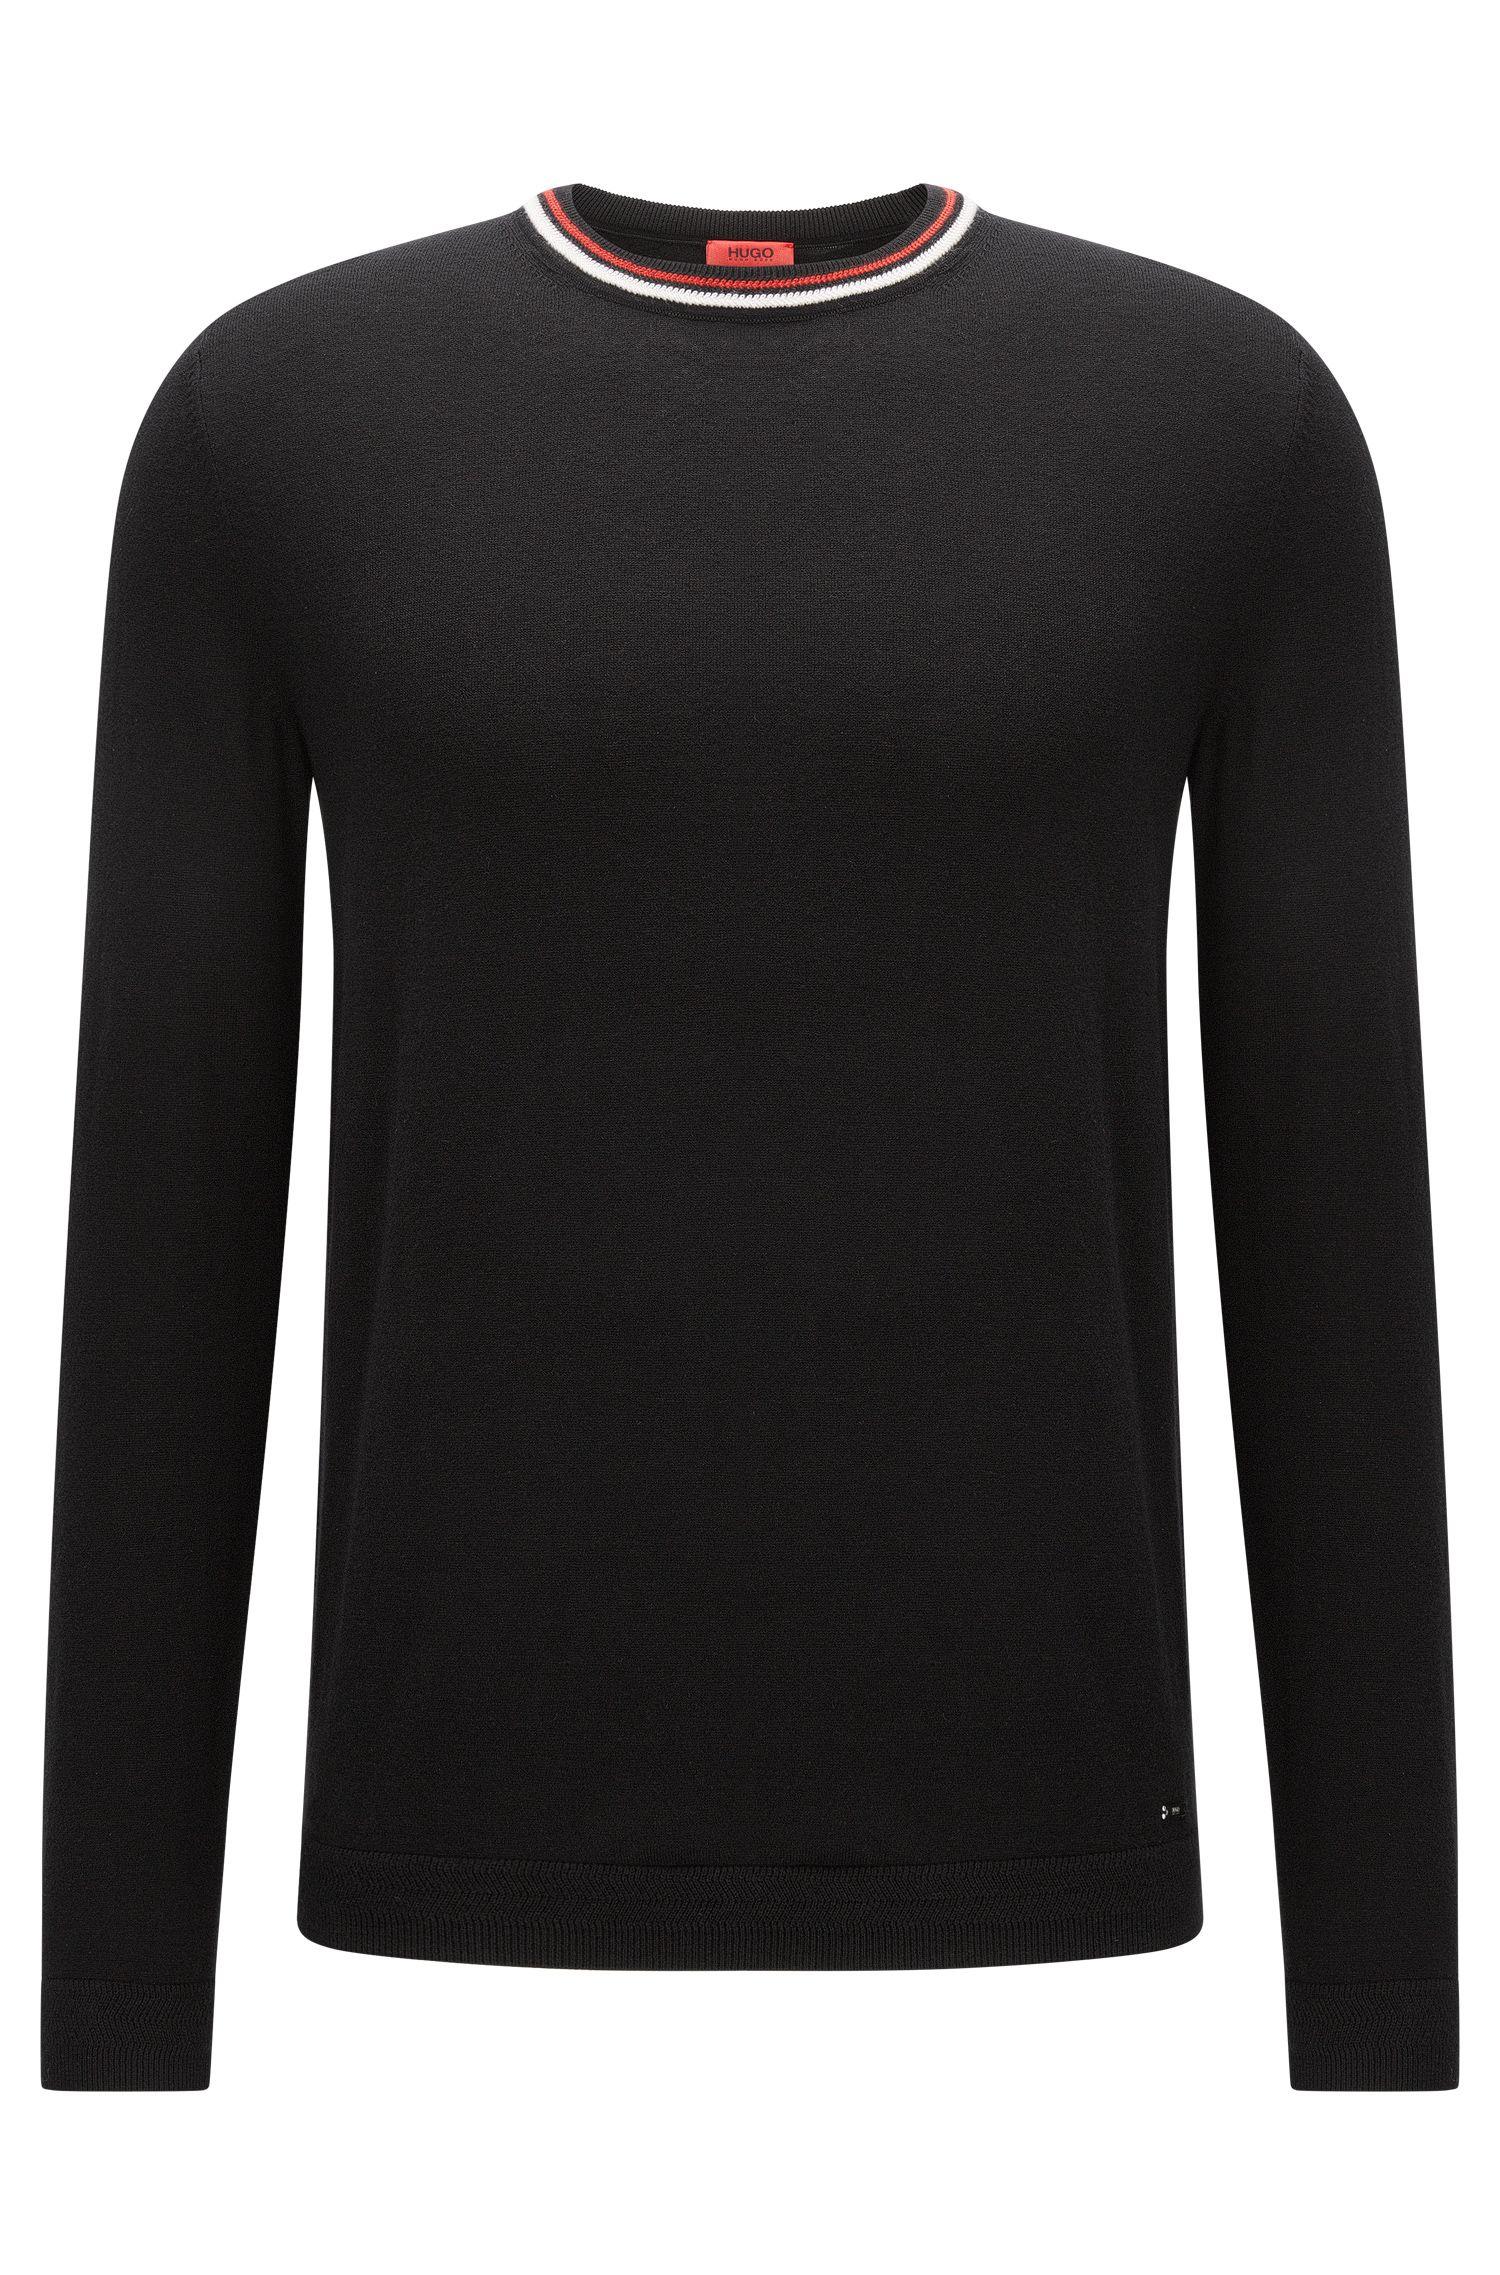 Cotton-Cashmere Sweater | Sabo